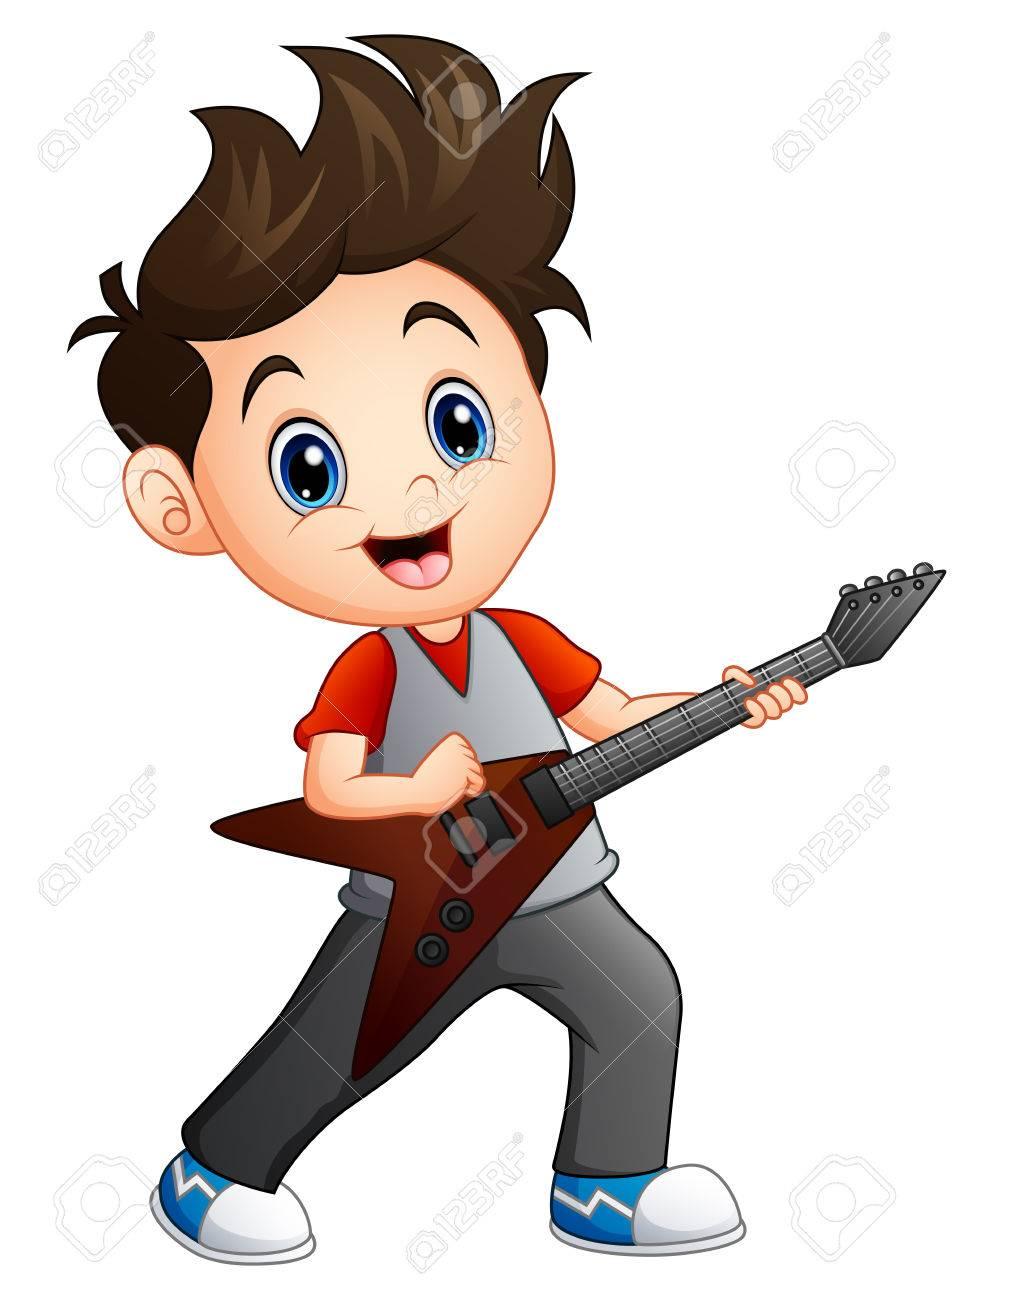 Cartoon Boy Playing Electric Guitar Royalty Free Cliparts Vectors